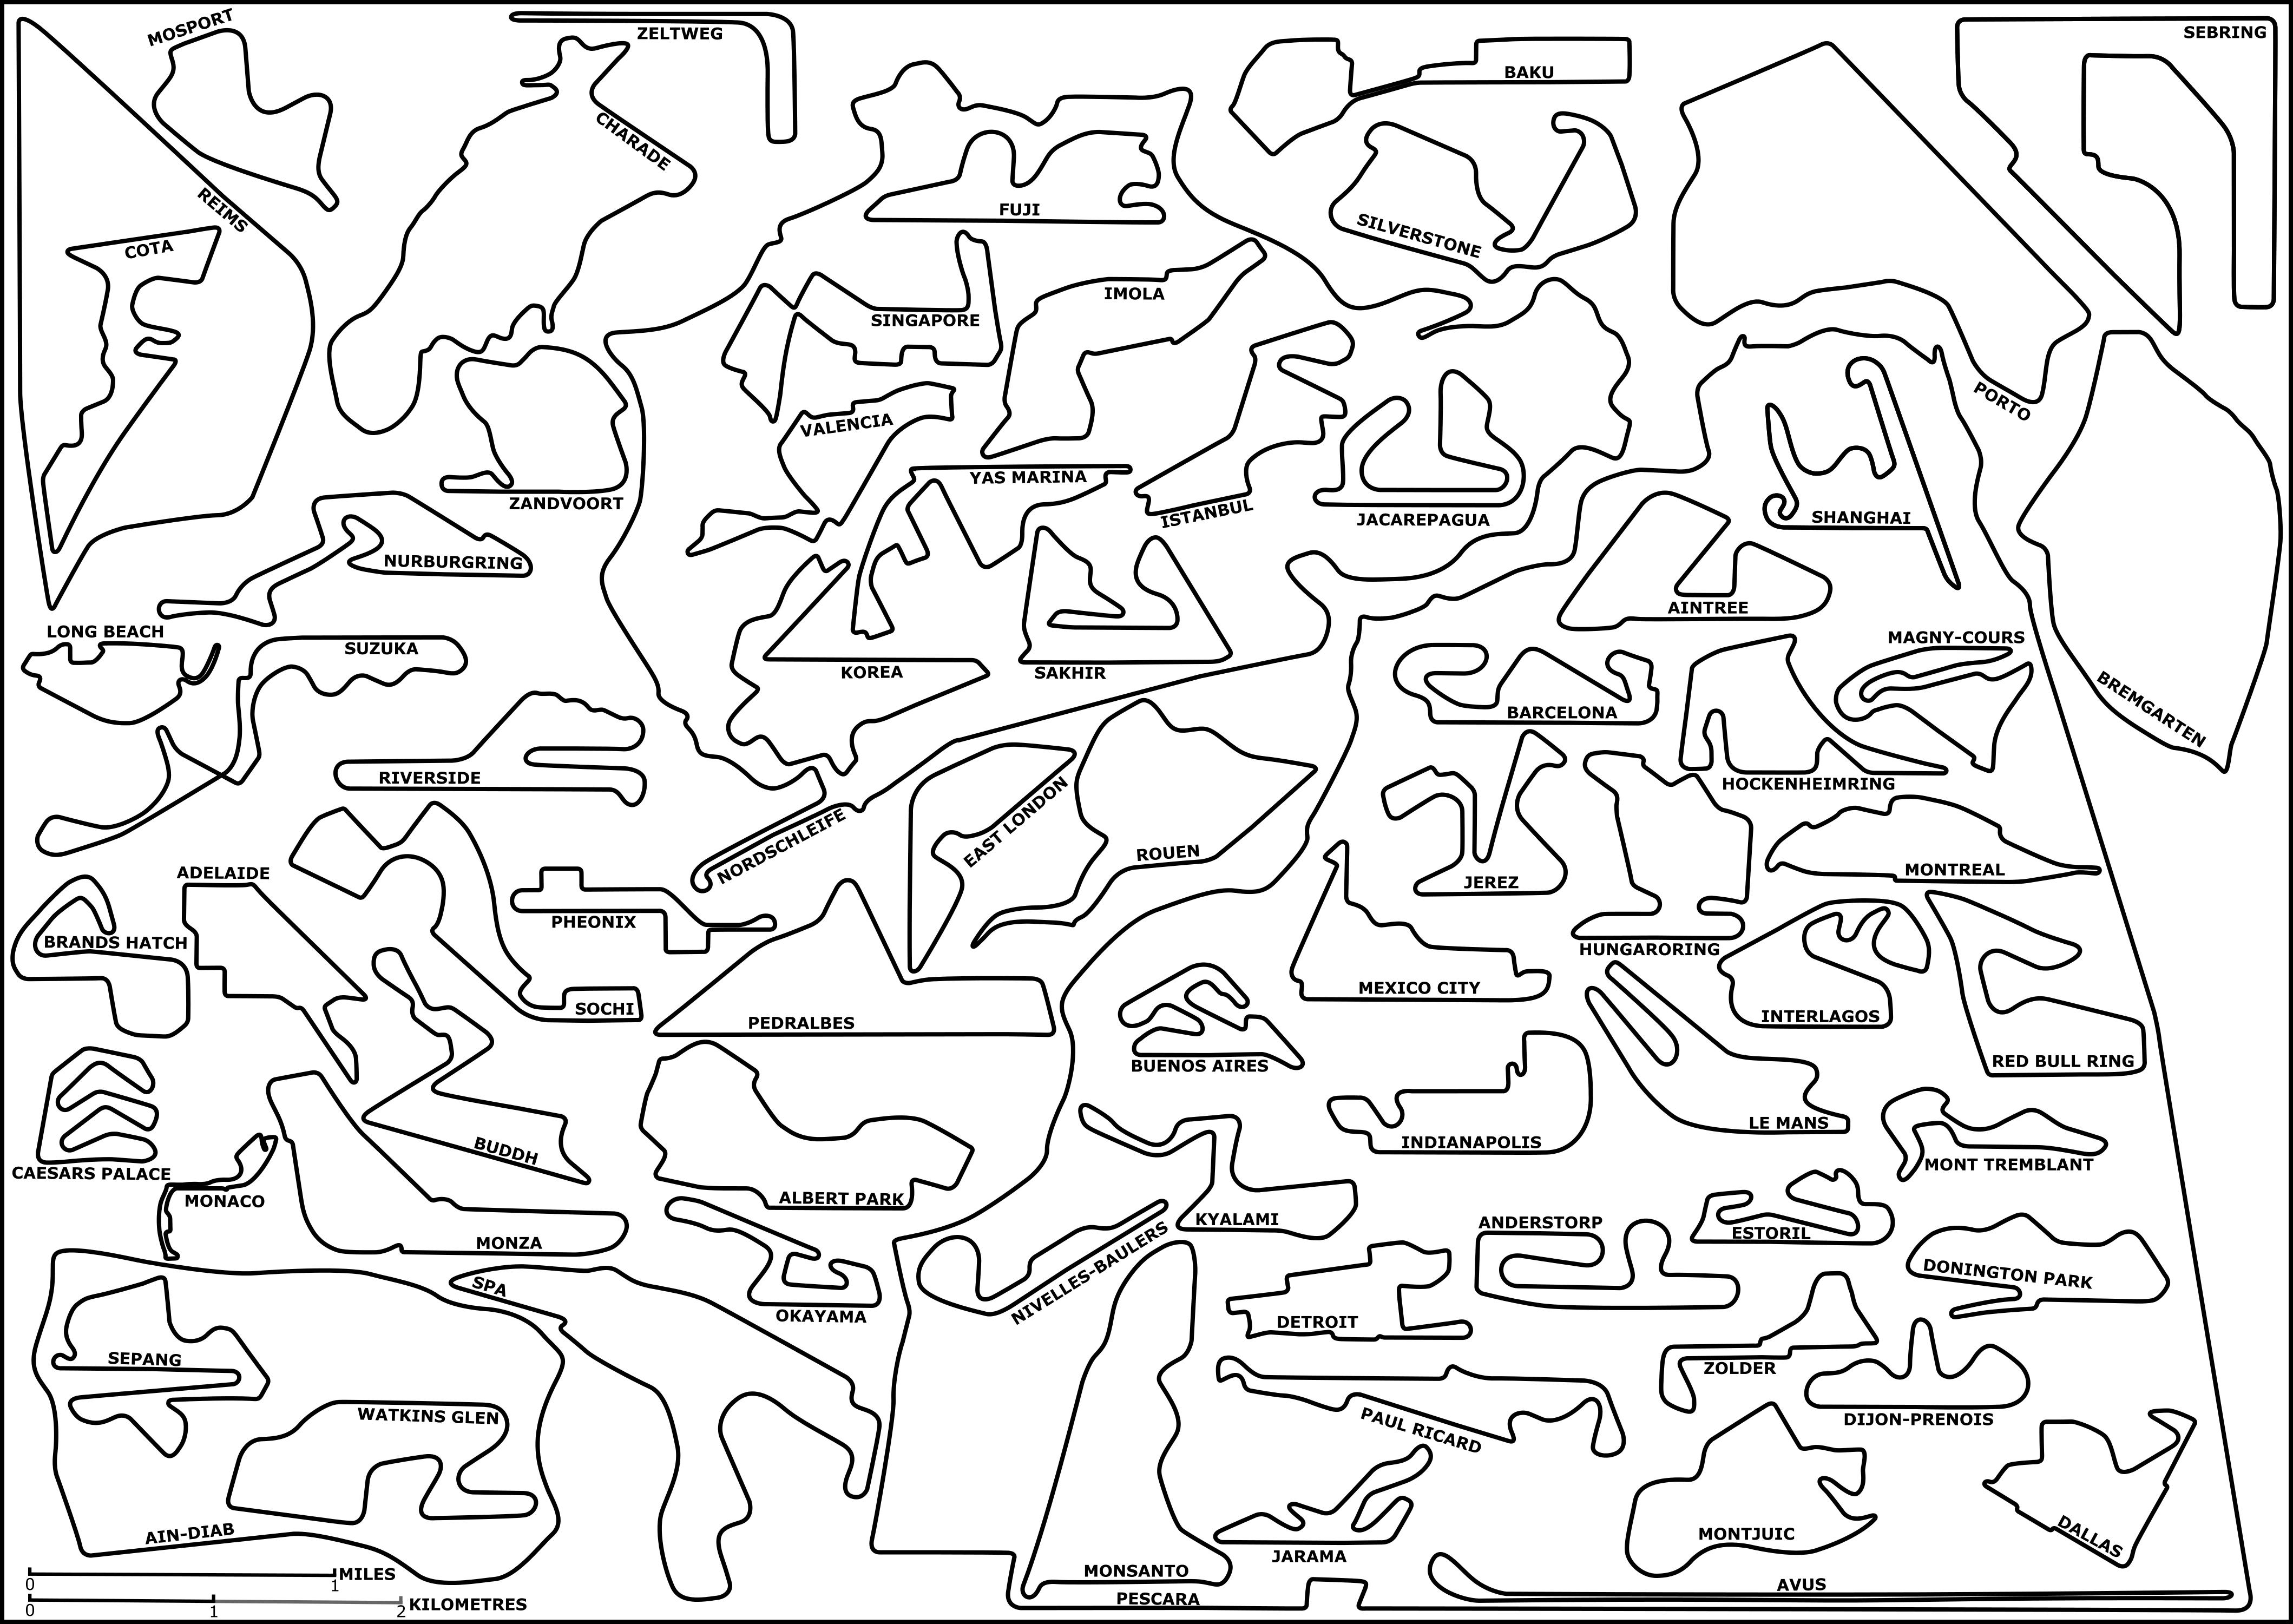 Every Formula 1 Grand Prix Circuit To Scale Oc Formula1